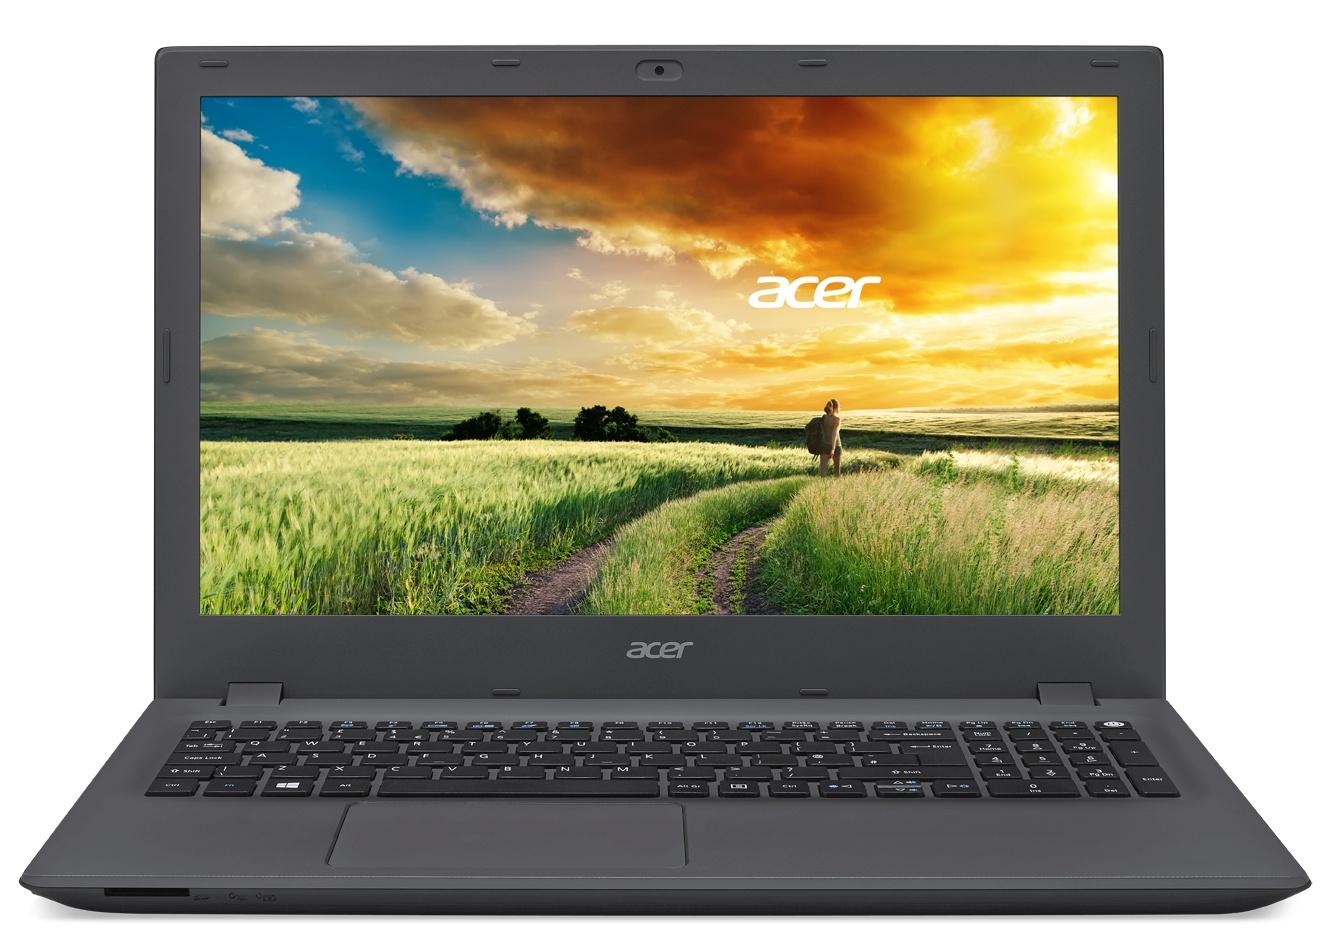 Acer Aspire E15 15,6/i3-5005U/4G/1TB/NV/W10 šedá